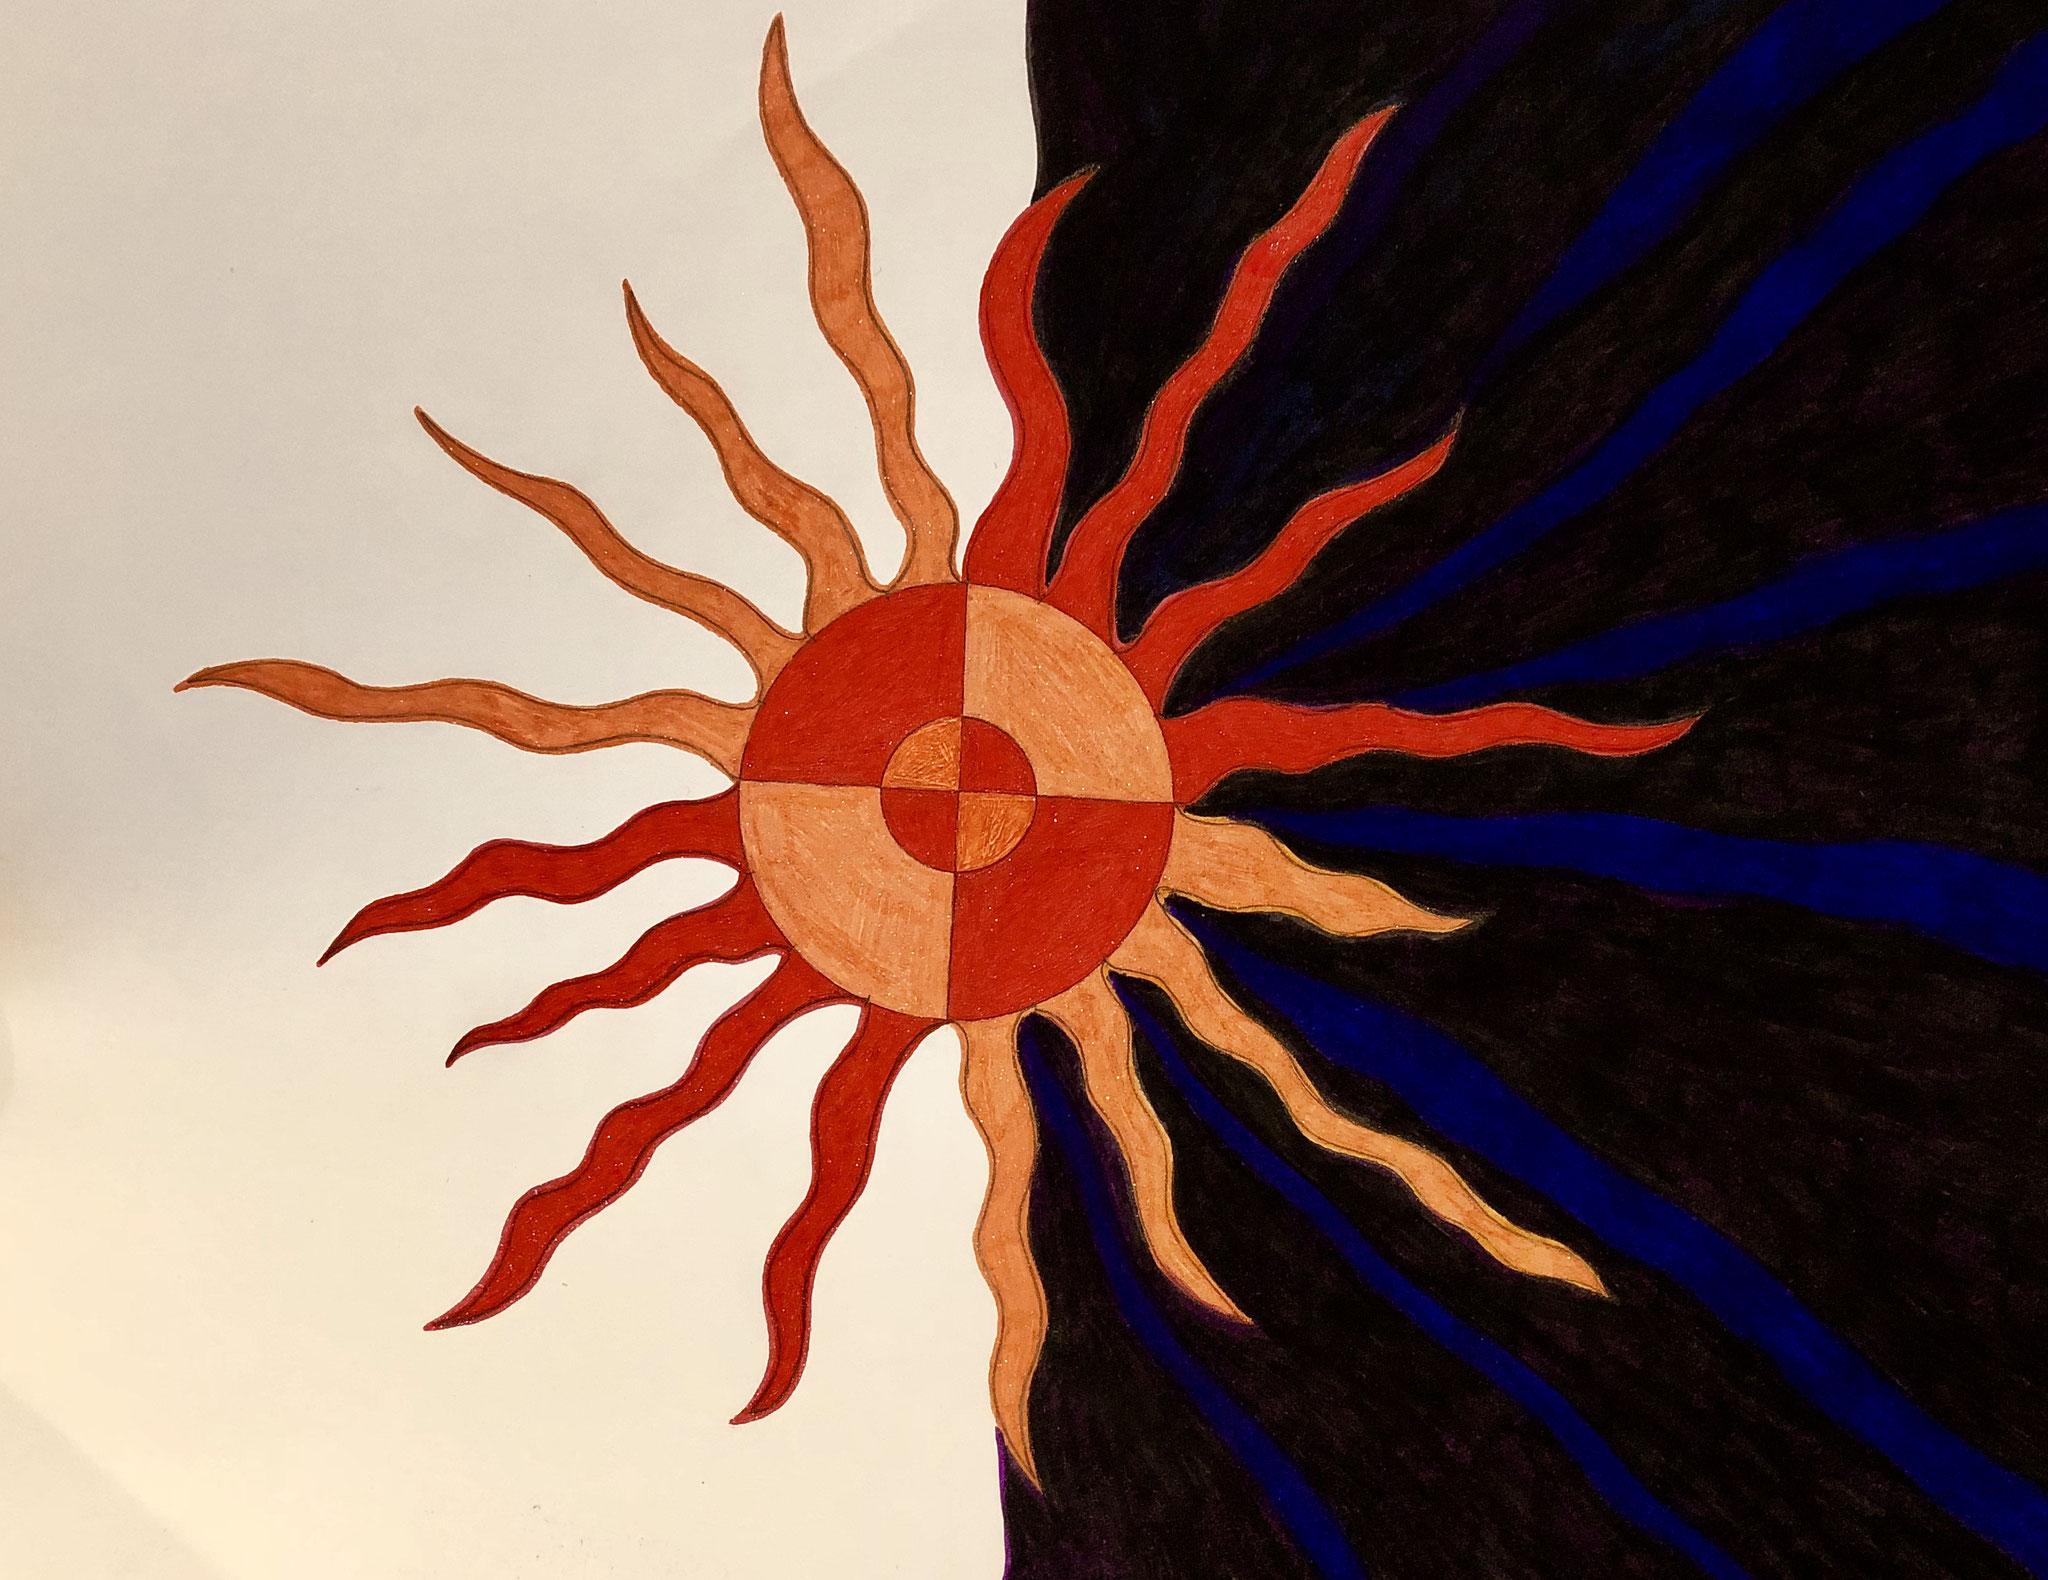 #innersun #twoshades #expansion #light #sun #consciousness #balancingact #letspaintpeace #metaphysical